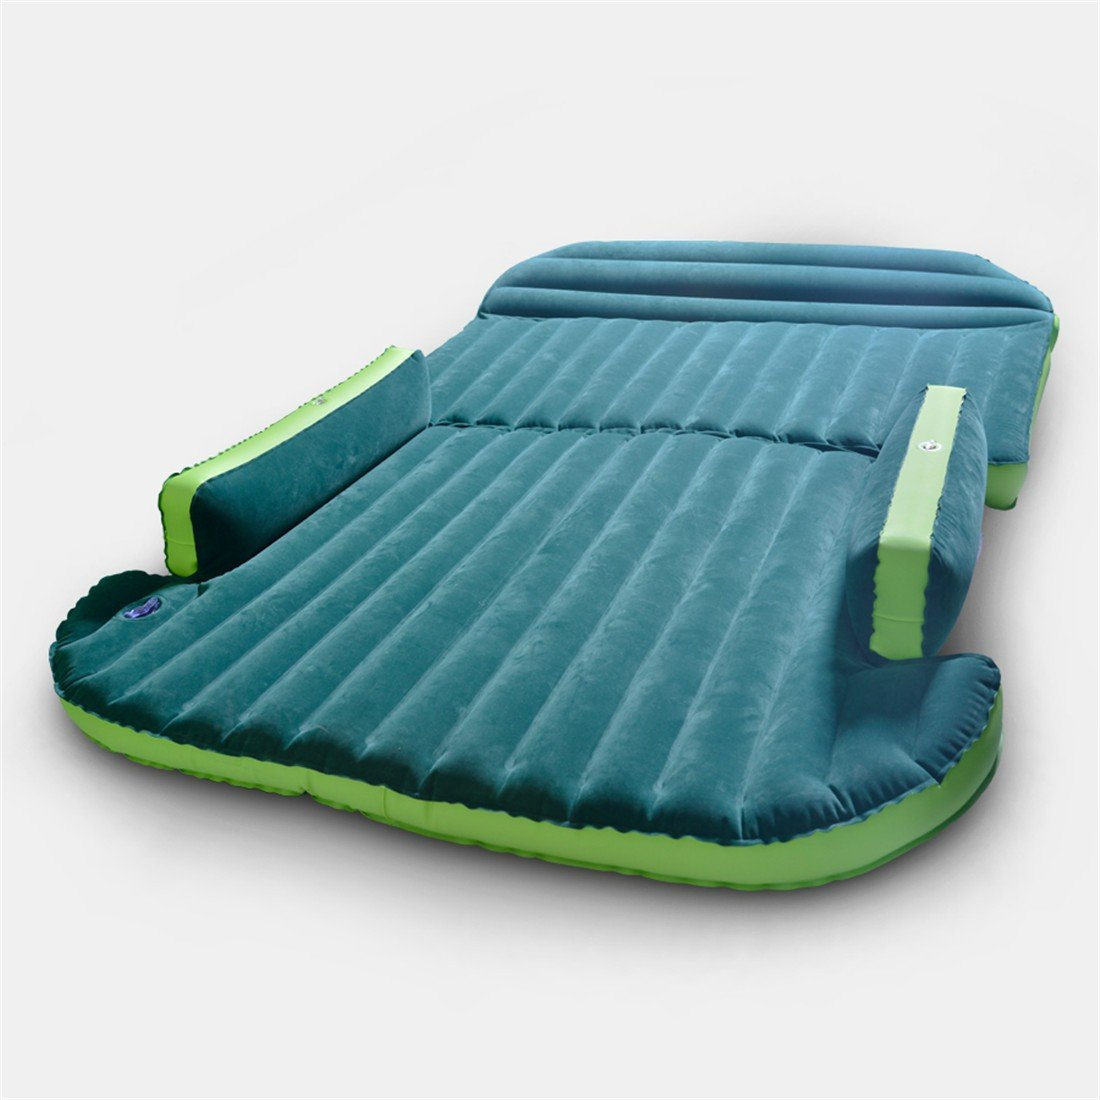 STAZSX Aufblasbare Matratze Auto Auto Bett Auto Aufblasbare Kissen Bett SUV Kofferraum-135x78CM